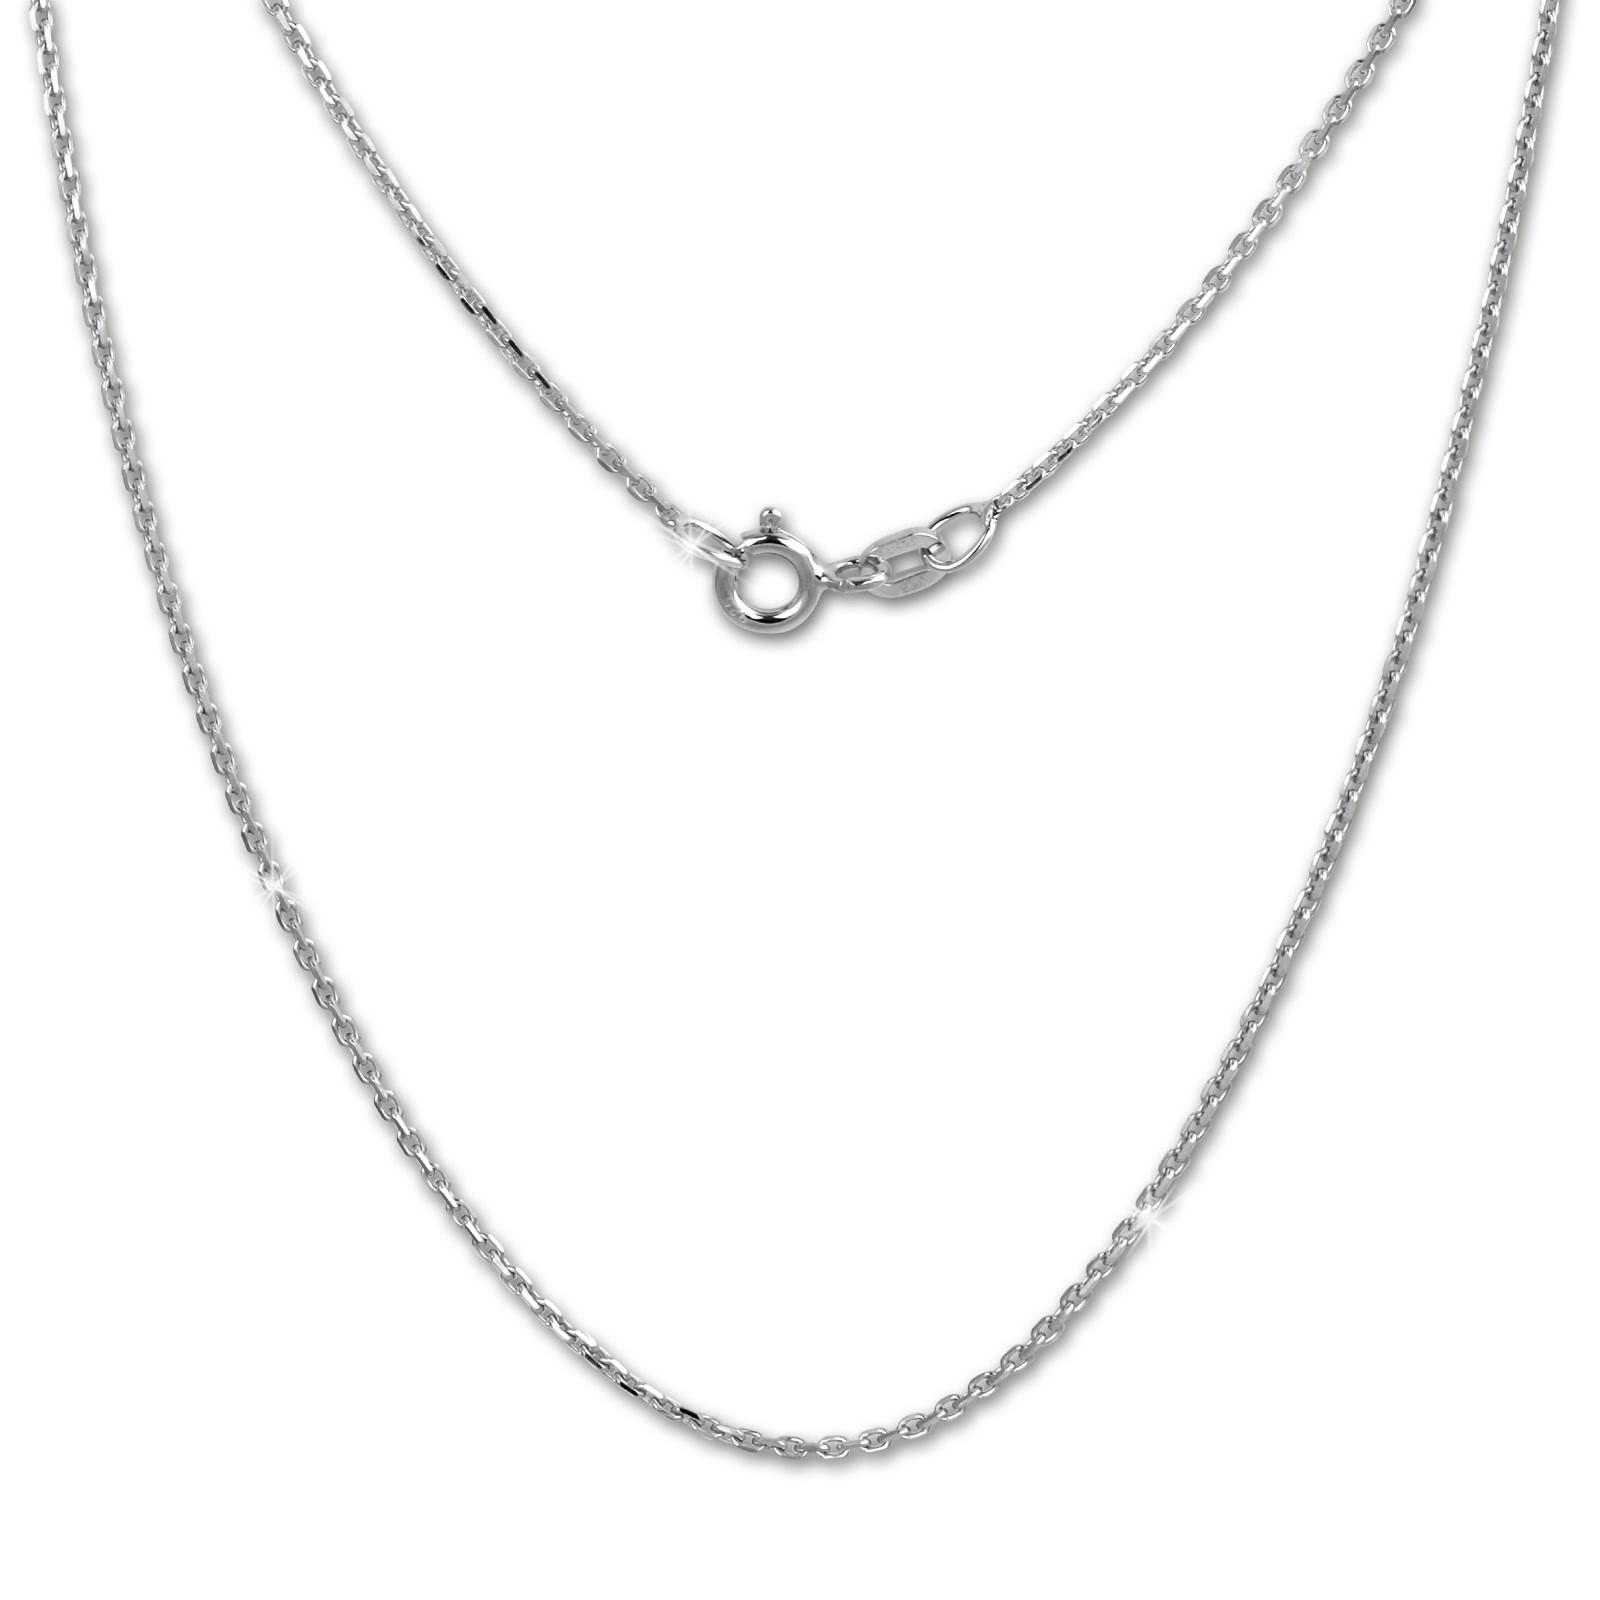 SilberDream Kette Anker diamantiert 925er Silber 42cm Damen Halskette SDK28942J